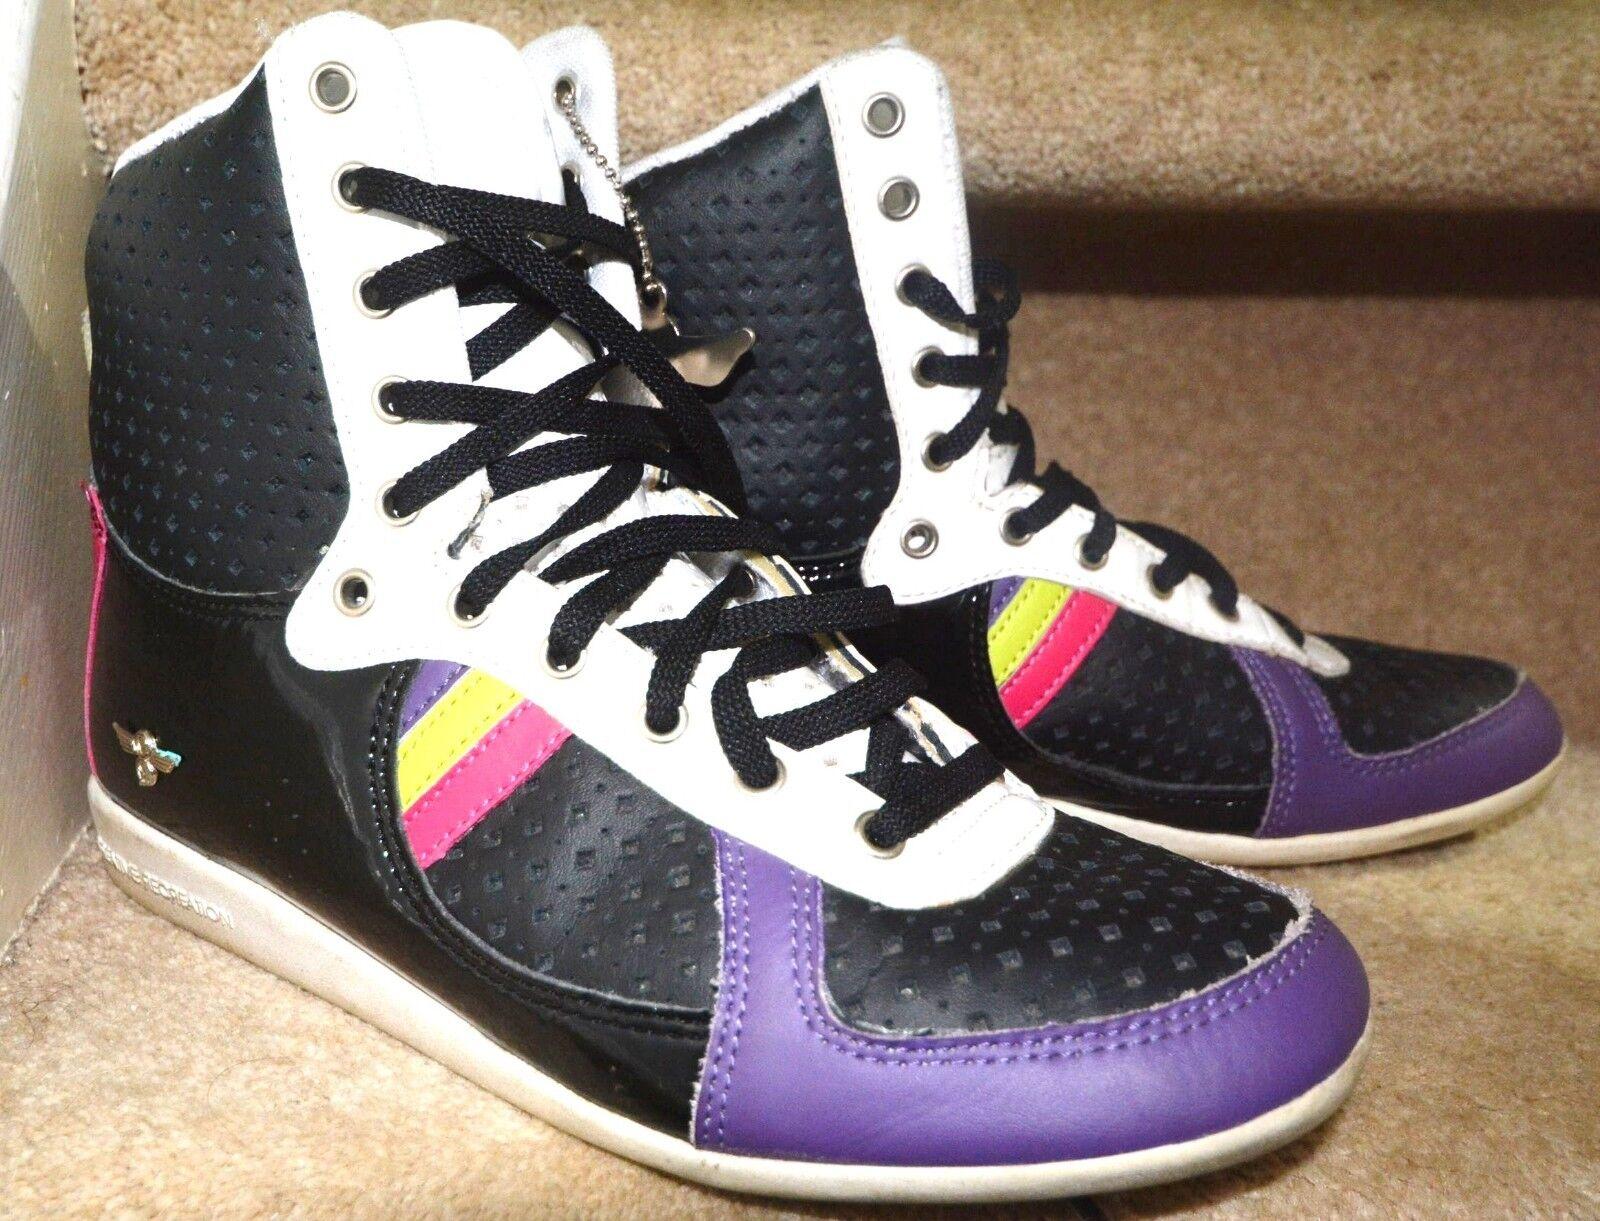 Vintage Damens Galow Hightop Trainer Stiefel USA 9L Uk 7L Hip hop Creative Receatio